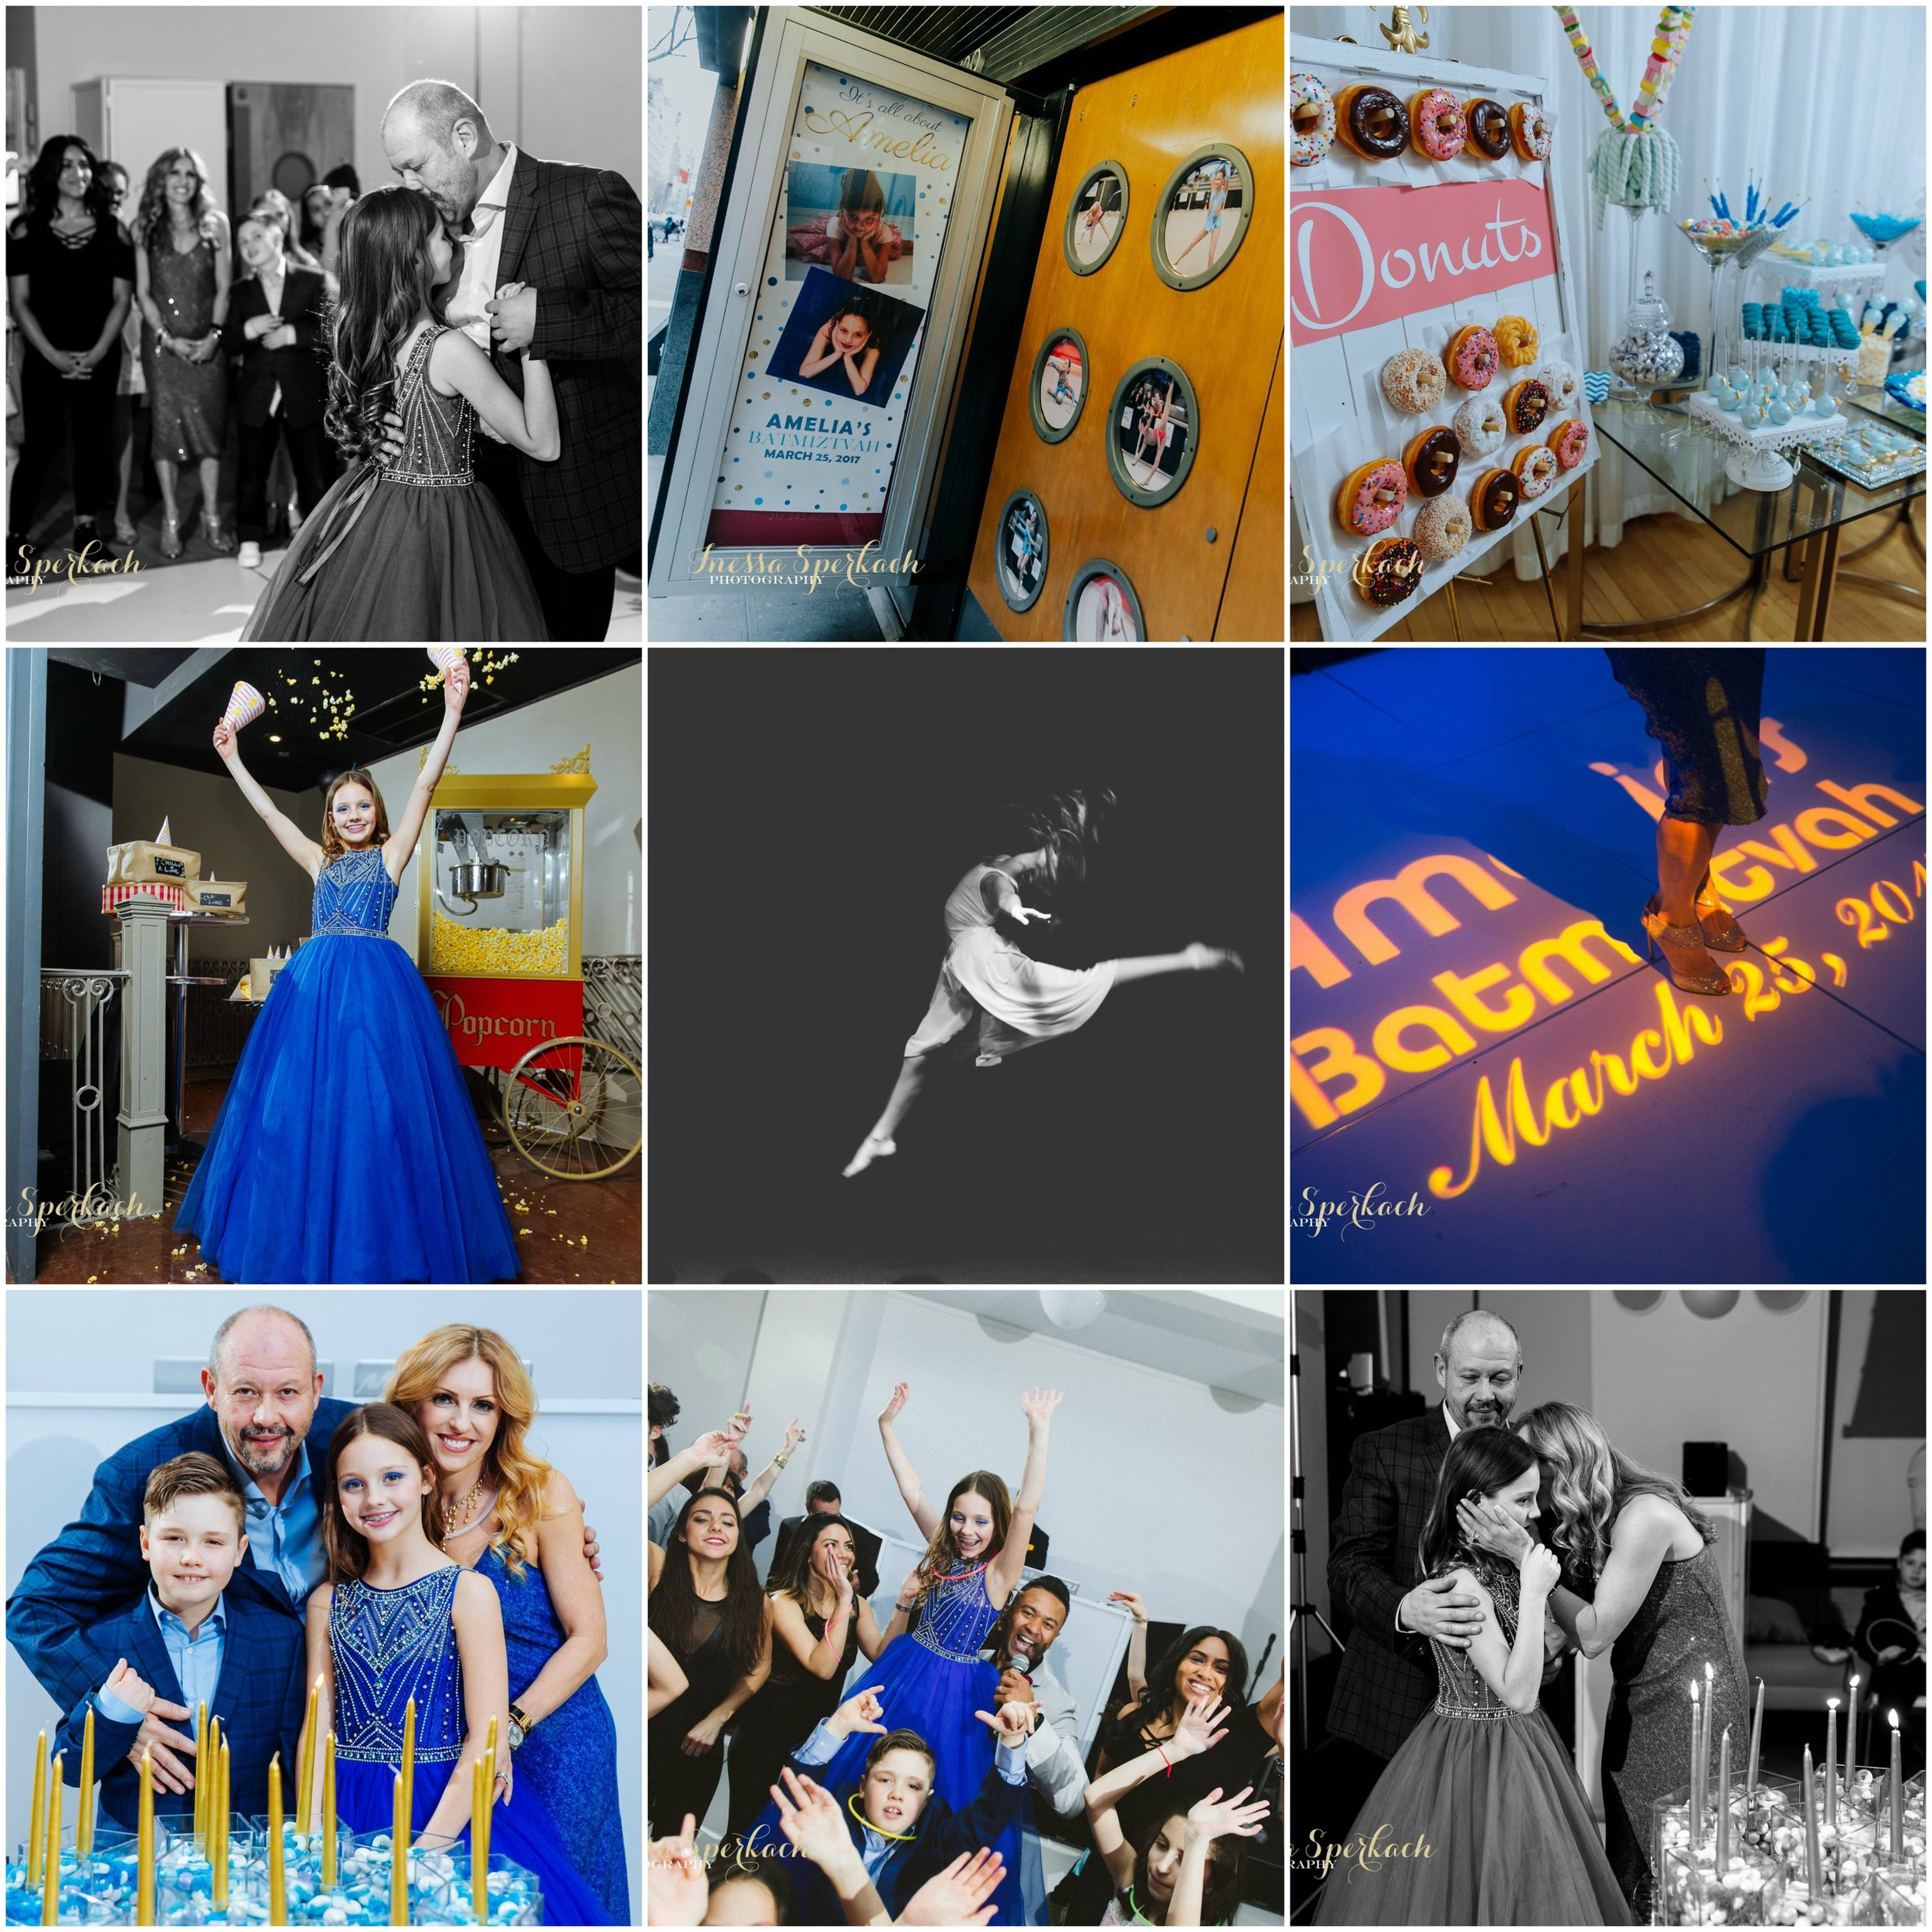 Collage of Amelia's event